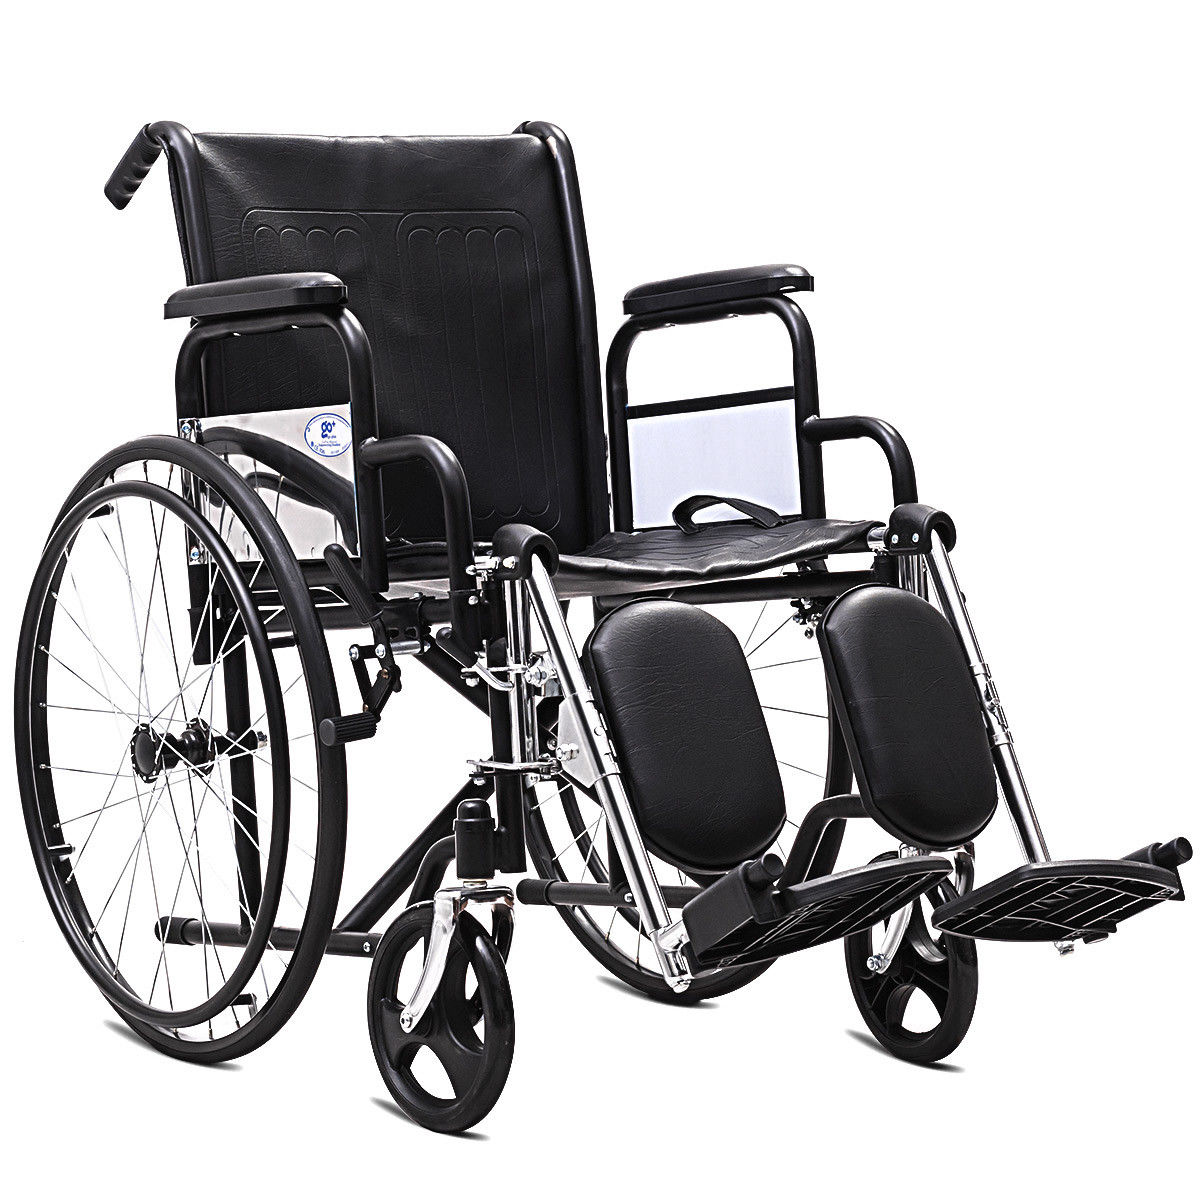 Goplus 24'' Folding Lightweight Wheelchair Arm Detachable with Elevating Legrest